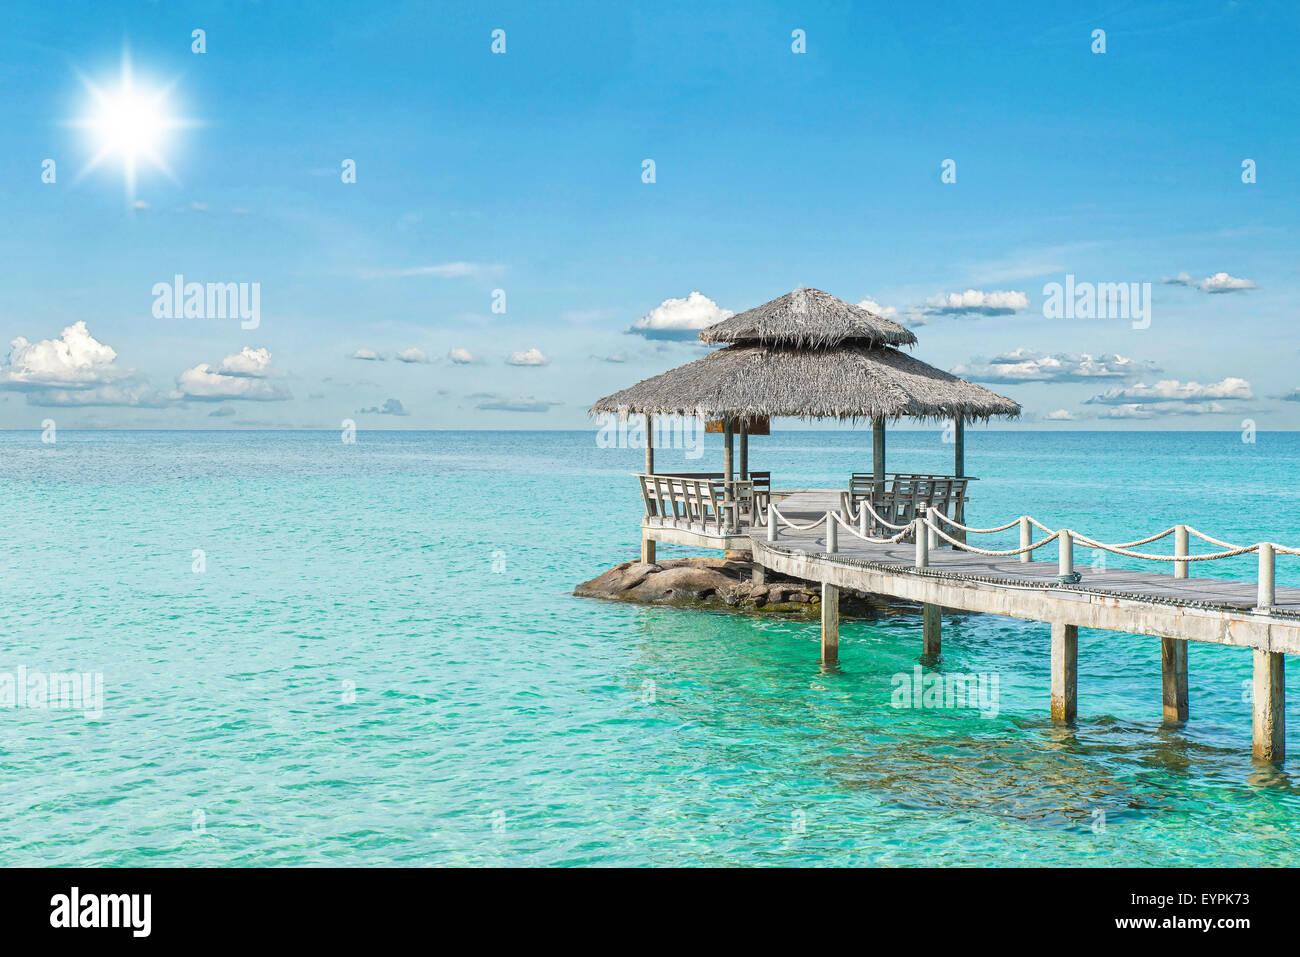 Sommer, Reisen, Urlaub und Ferien-Konzept - Holzmole in Phuket, Thailand Stockbild